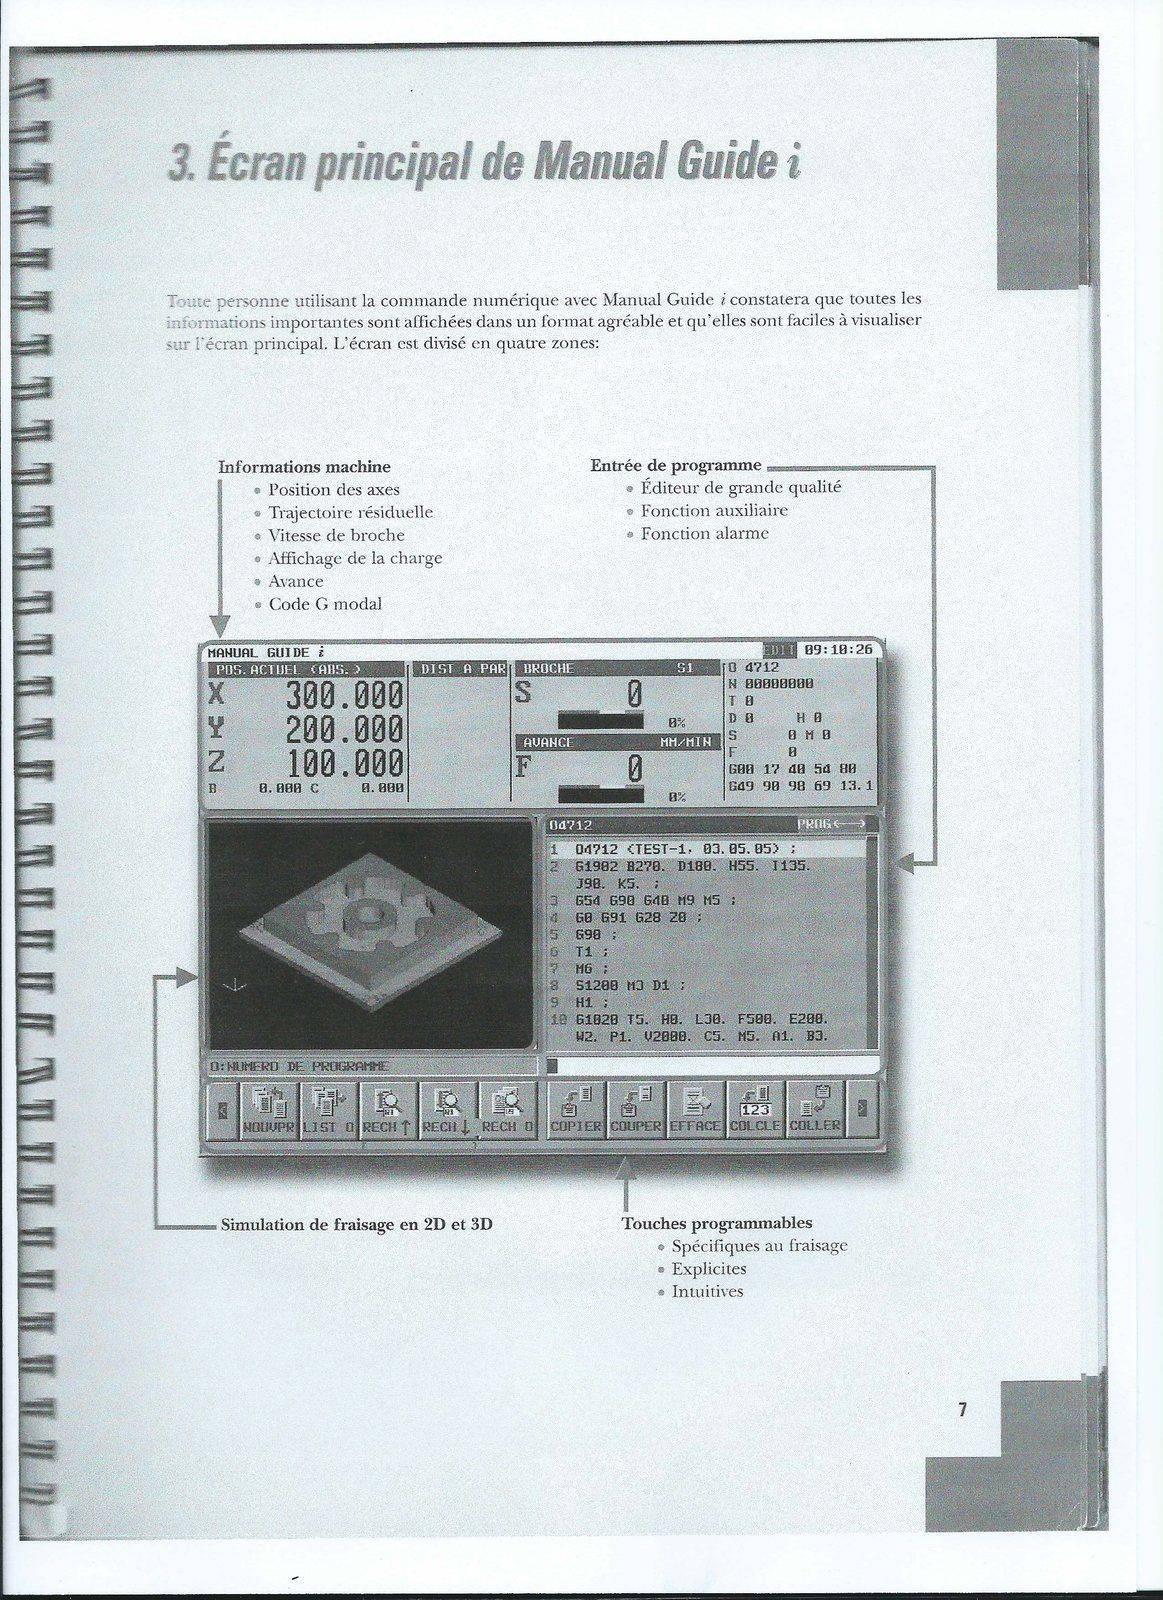 manuel guide 3.jpg